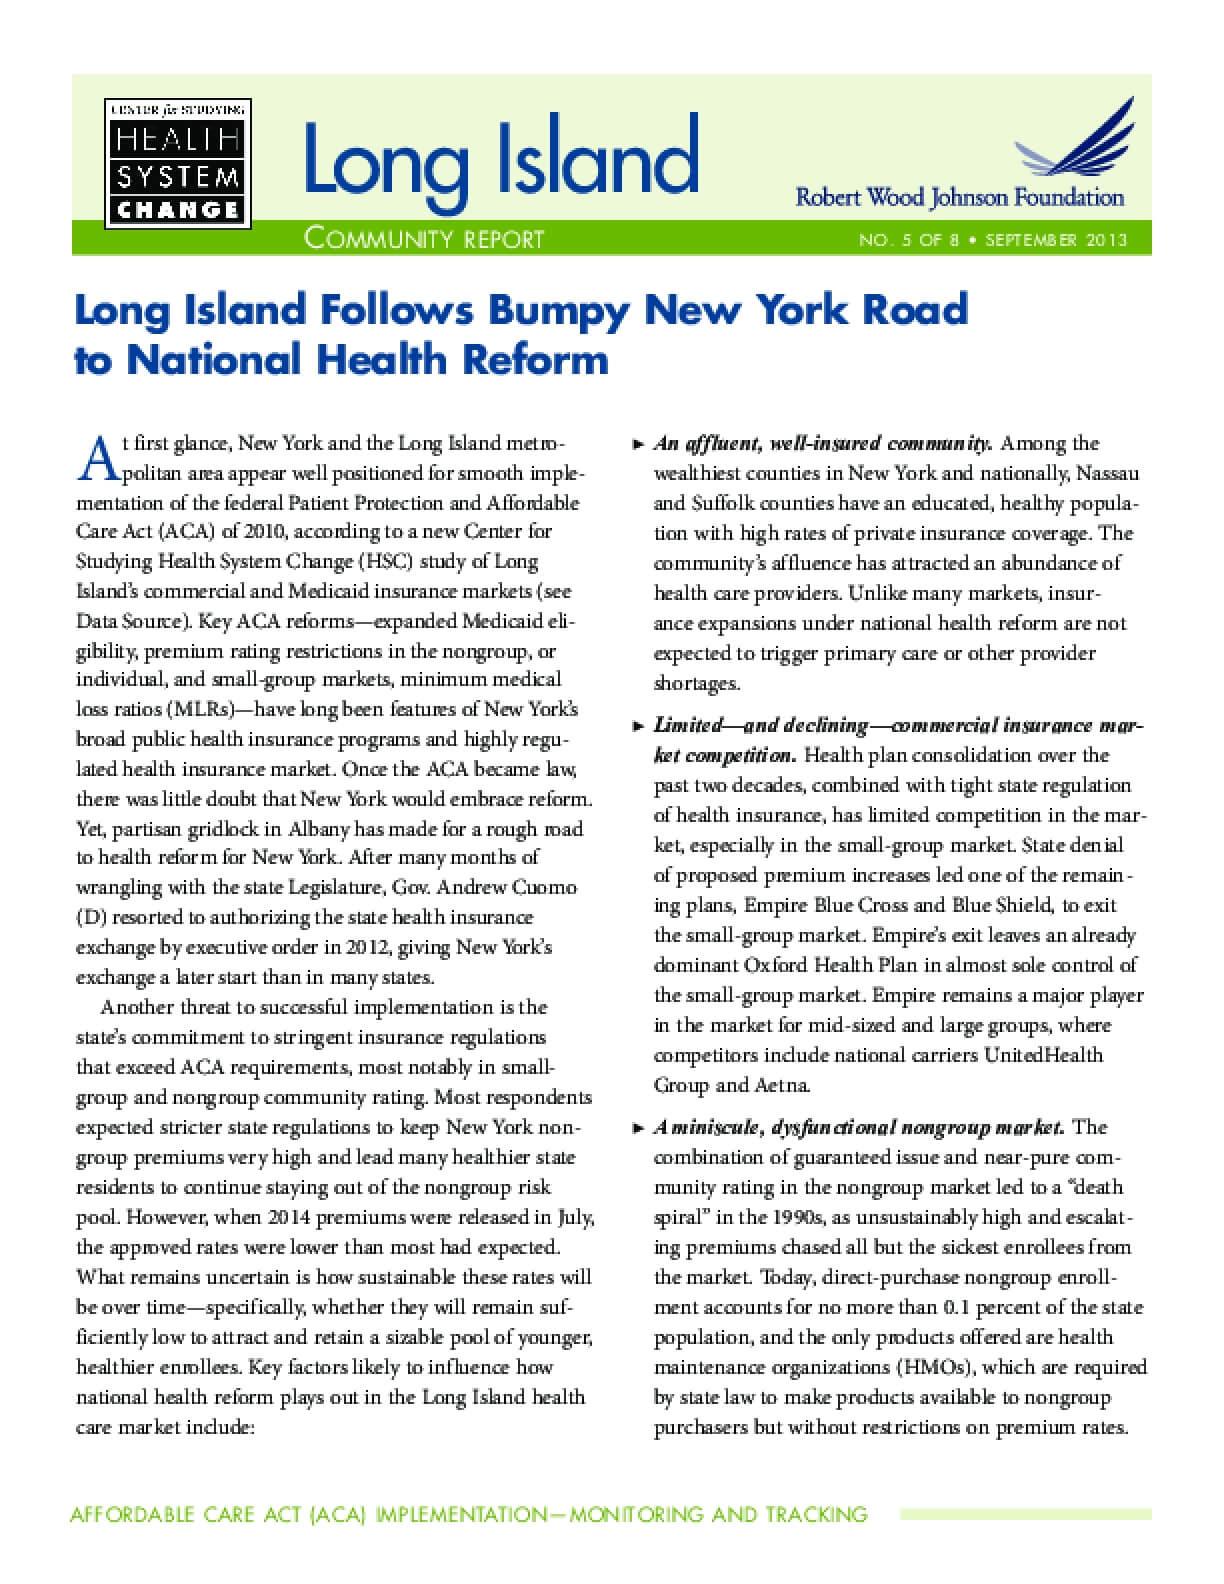 Long Island Follows Bumpy New York Road to National Health Reform